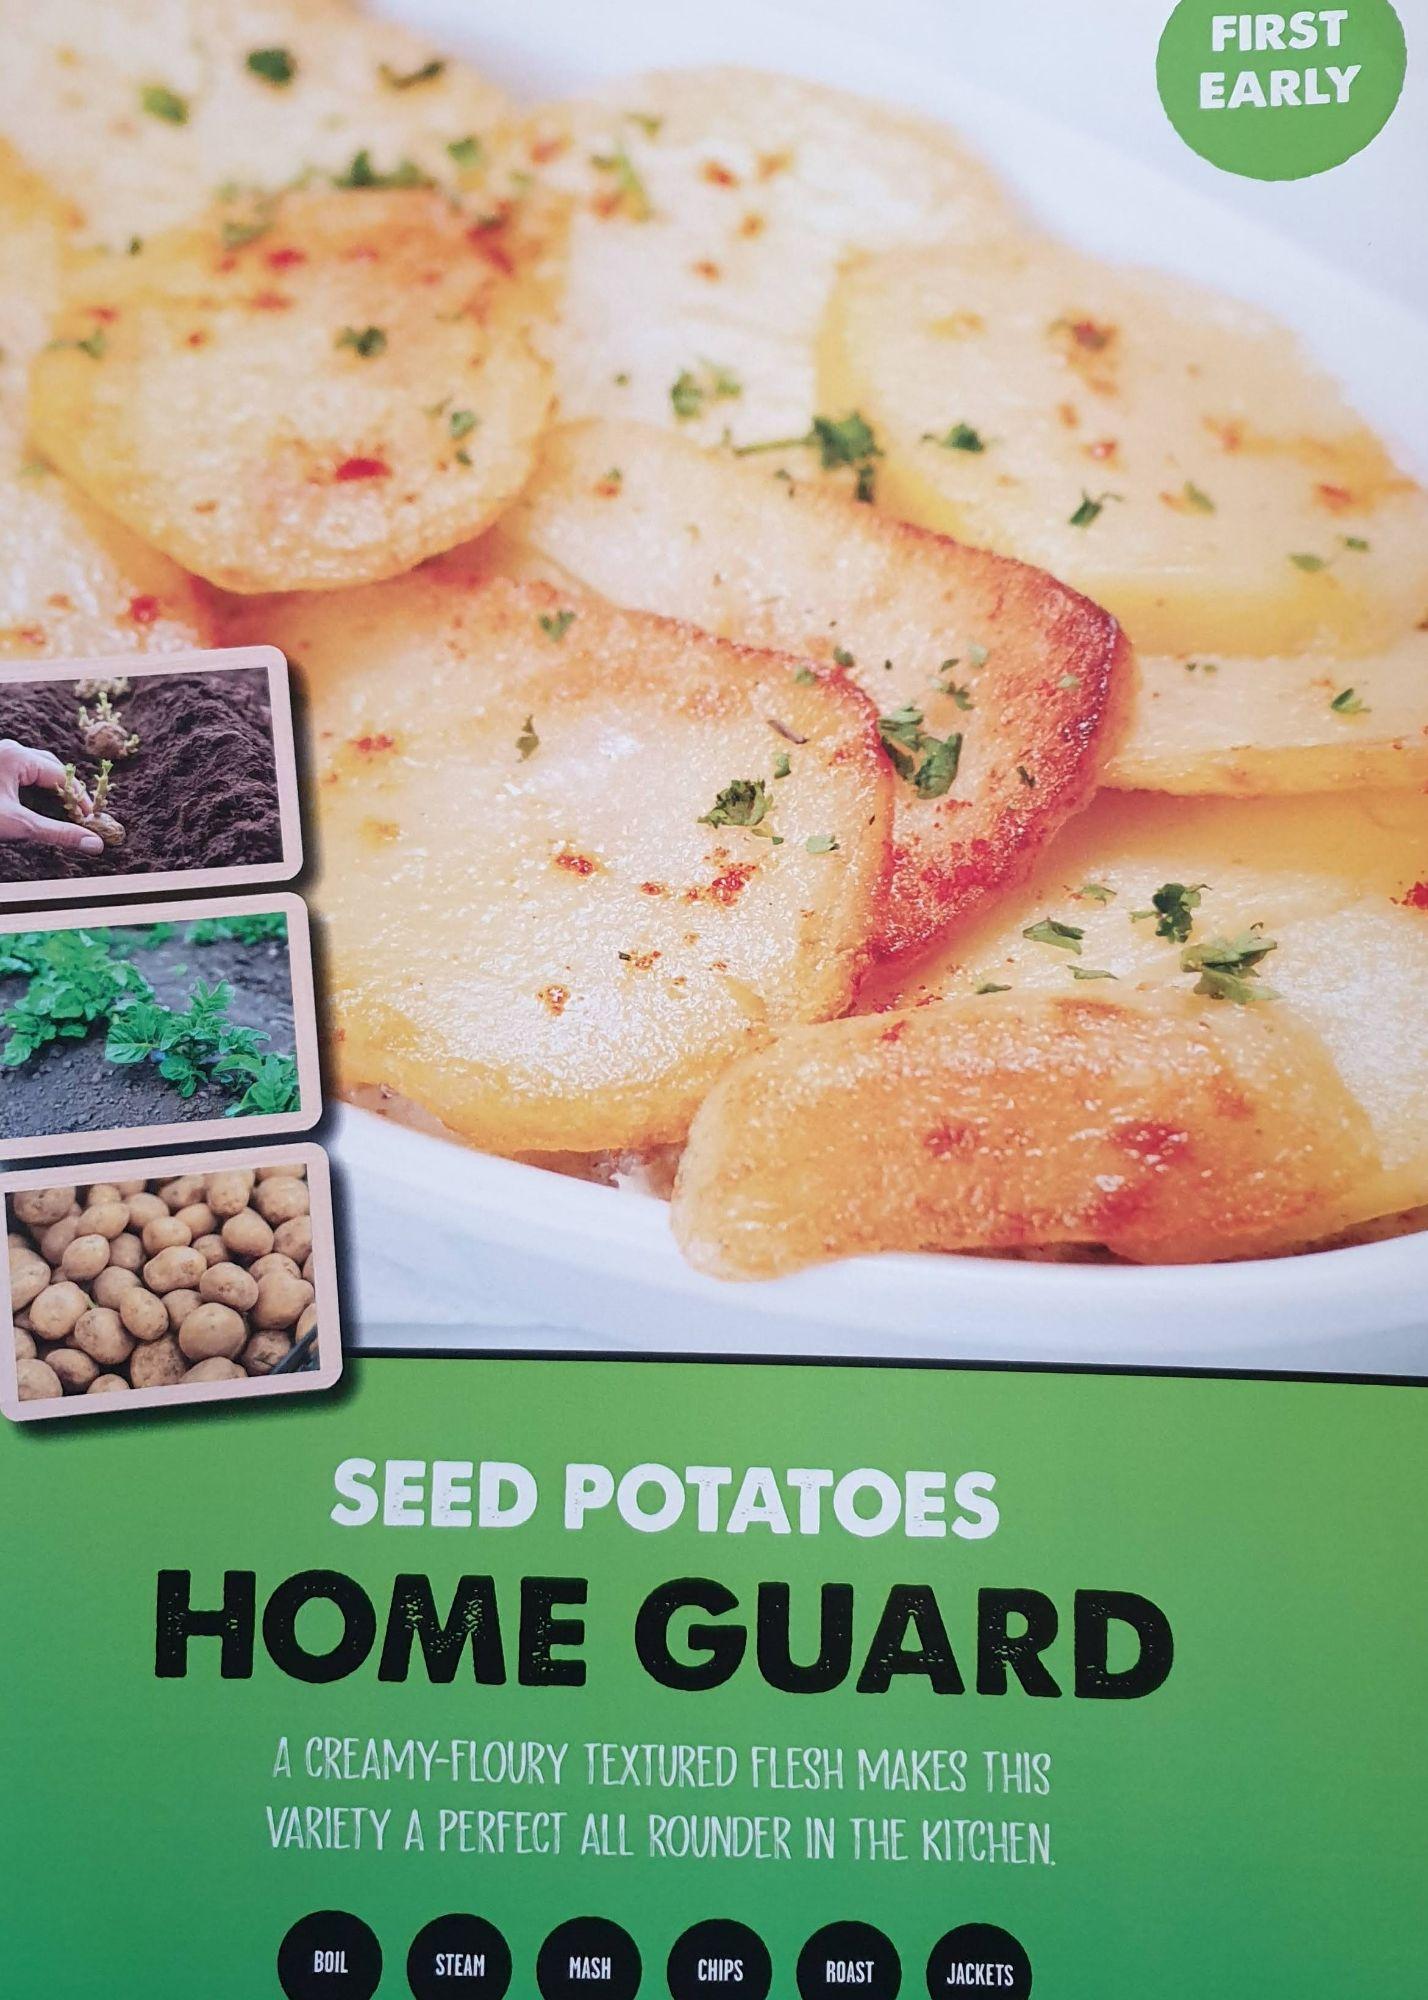 home_gueard_seed_potato_info.jpg